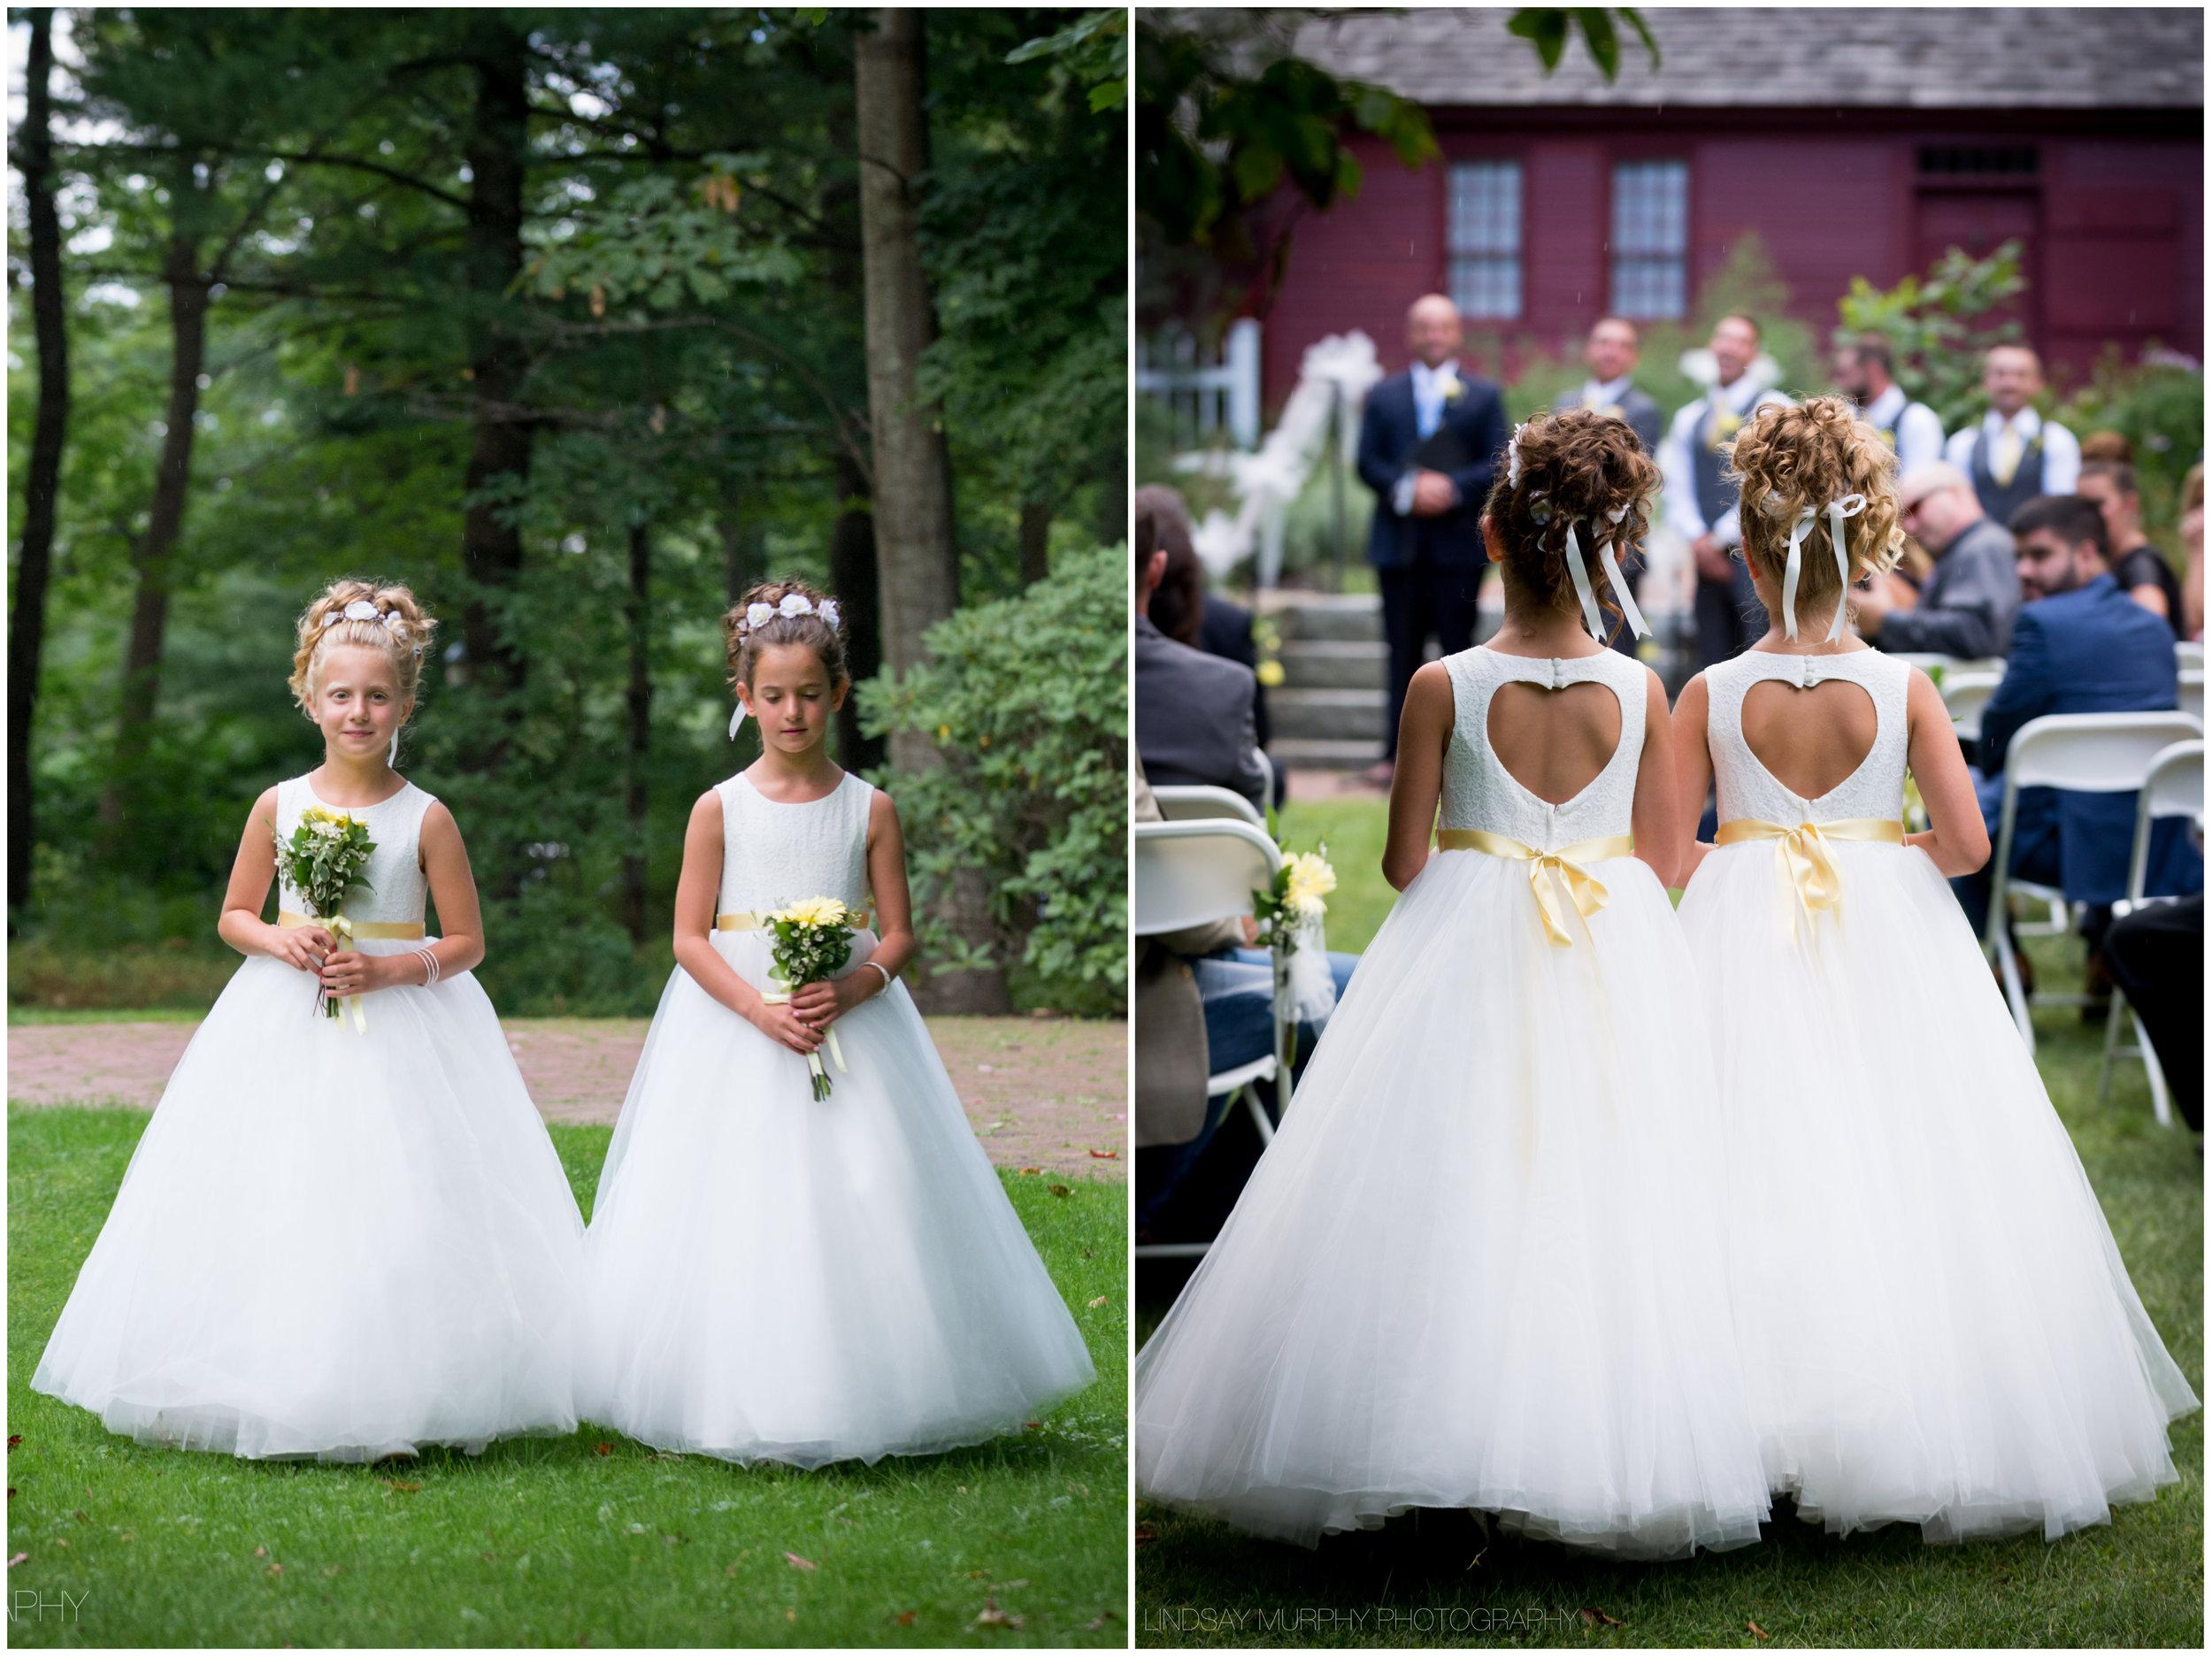 Maine_wedding64.jpg